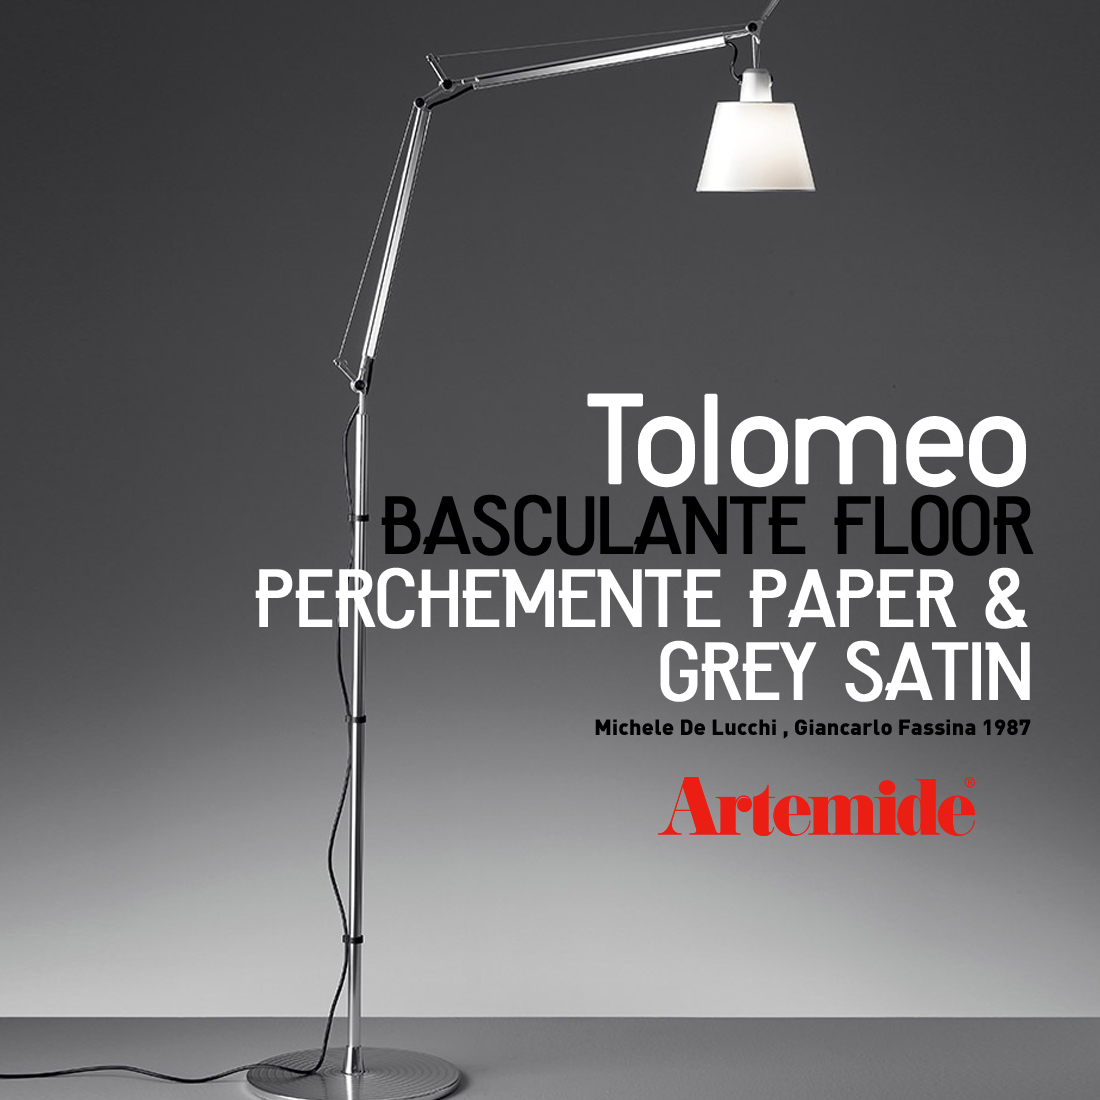 【Artemide アルテミデ】TOLOMEO BASCULANTE FLOOR トロメオ フロアランプ 電球仕様ライト 照明 リビング キッチン ダイニング フロアライト